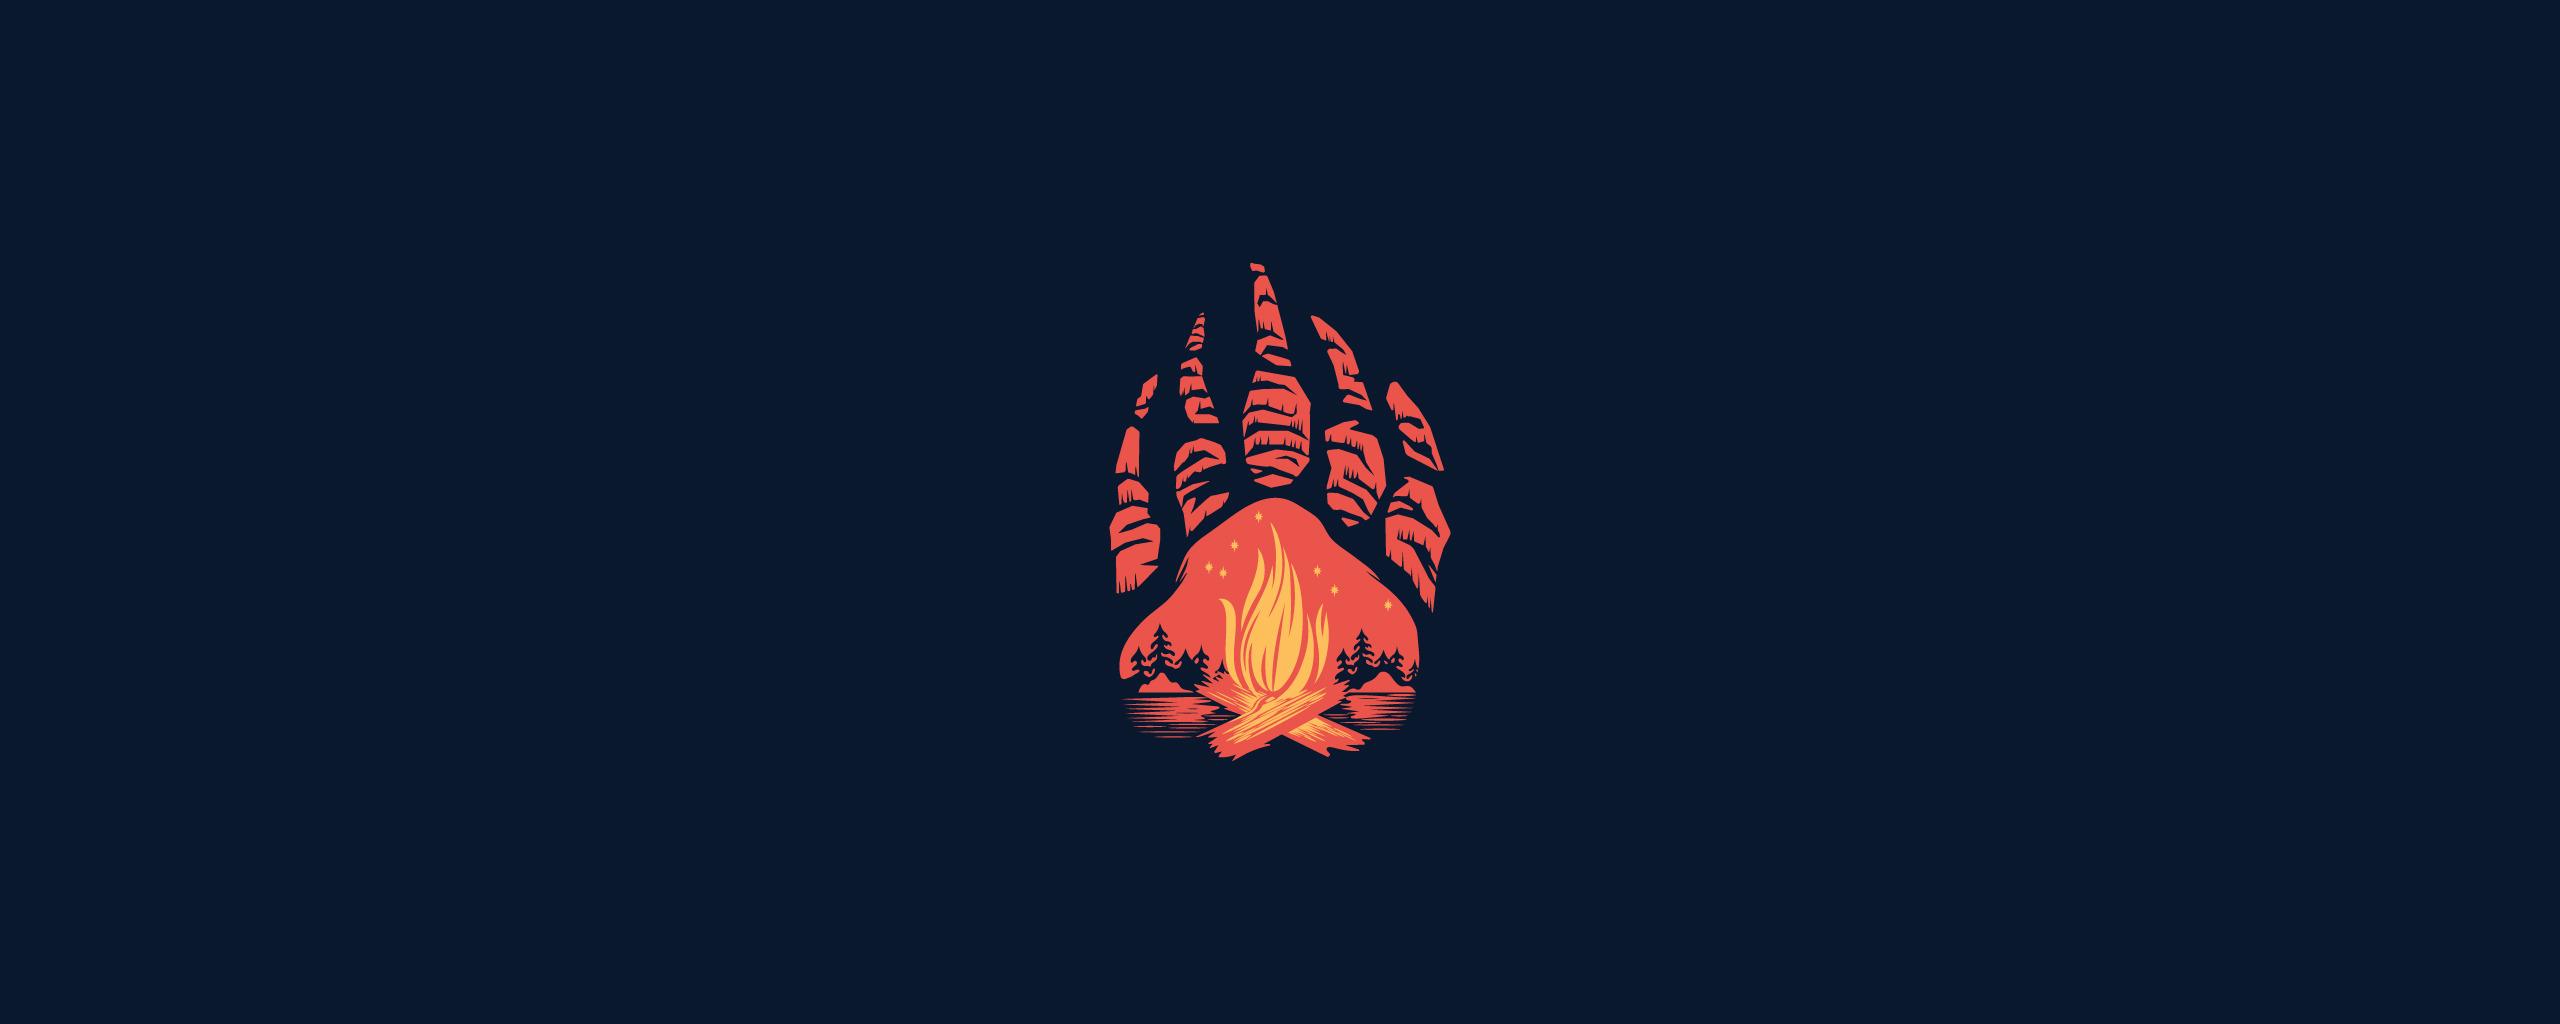 Download 2560x1024 Wallpaper Paws Campfire Minimal